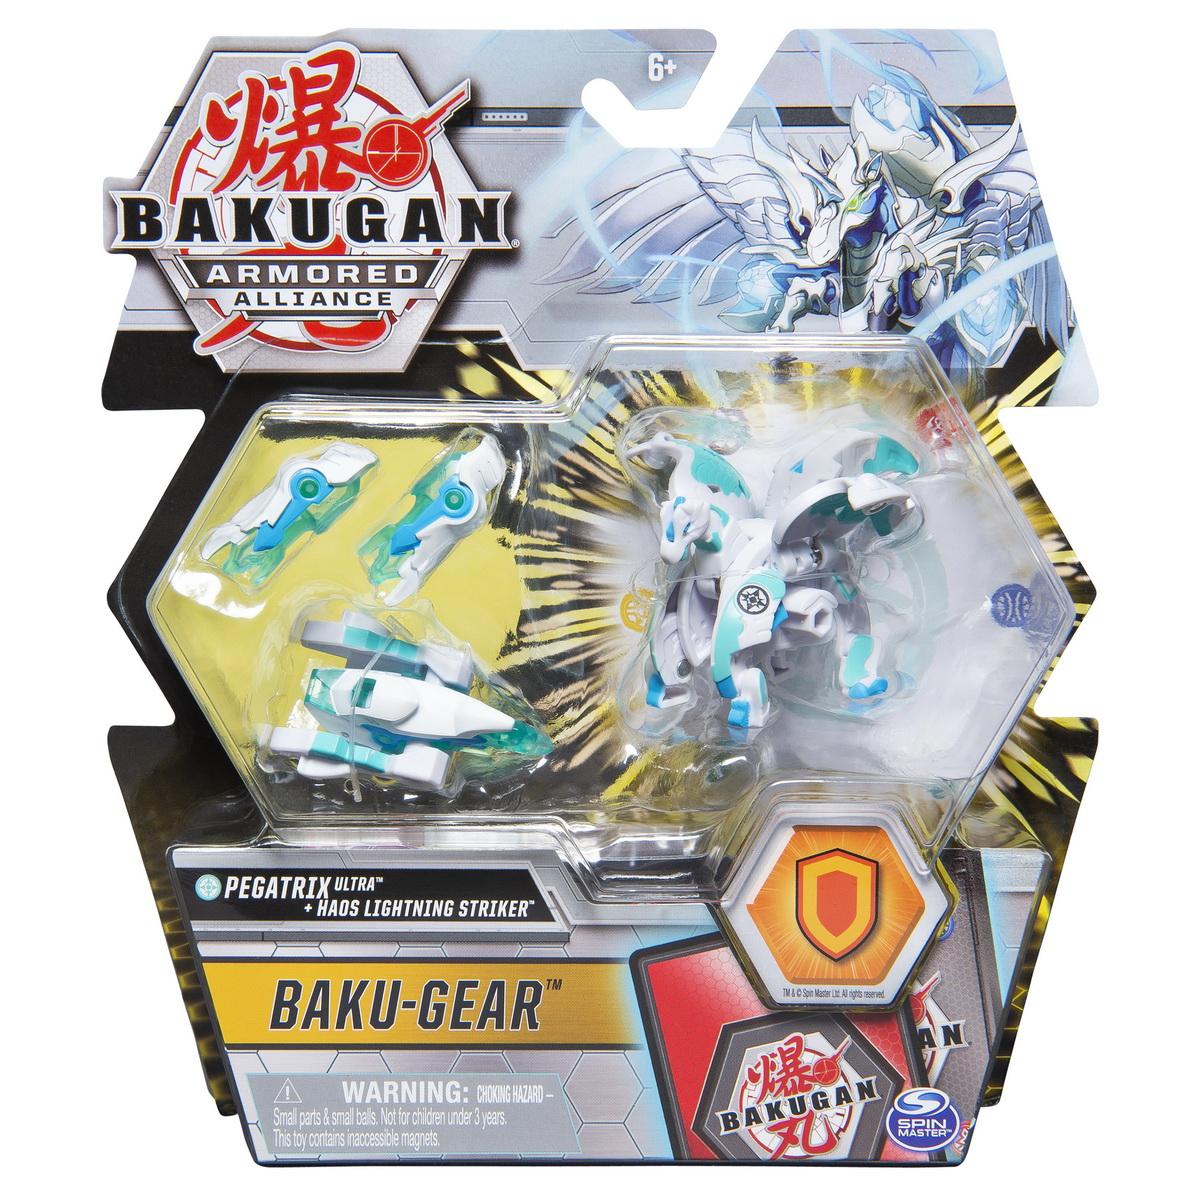 Bakugan S2 Bila Ultra Pegatrix Cu Echipament Baku-gear Haos Lightning Striker